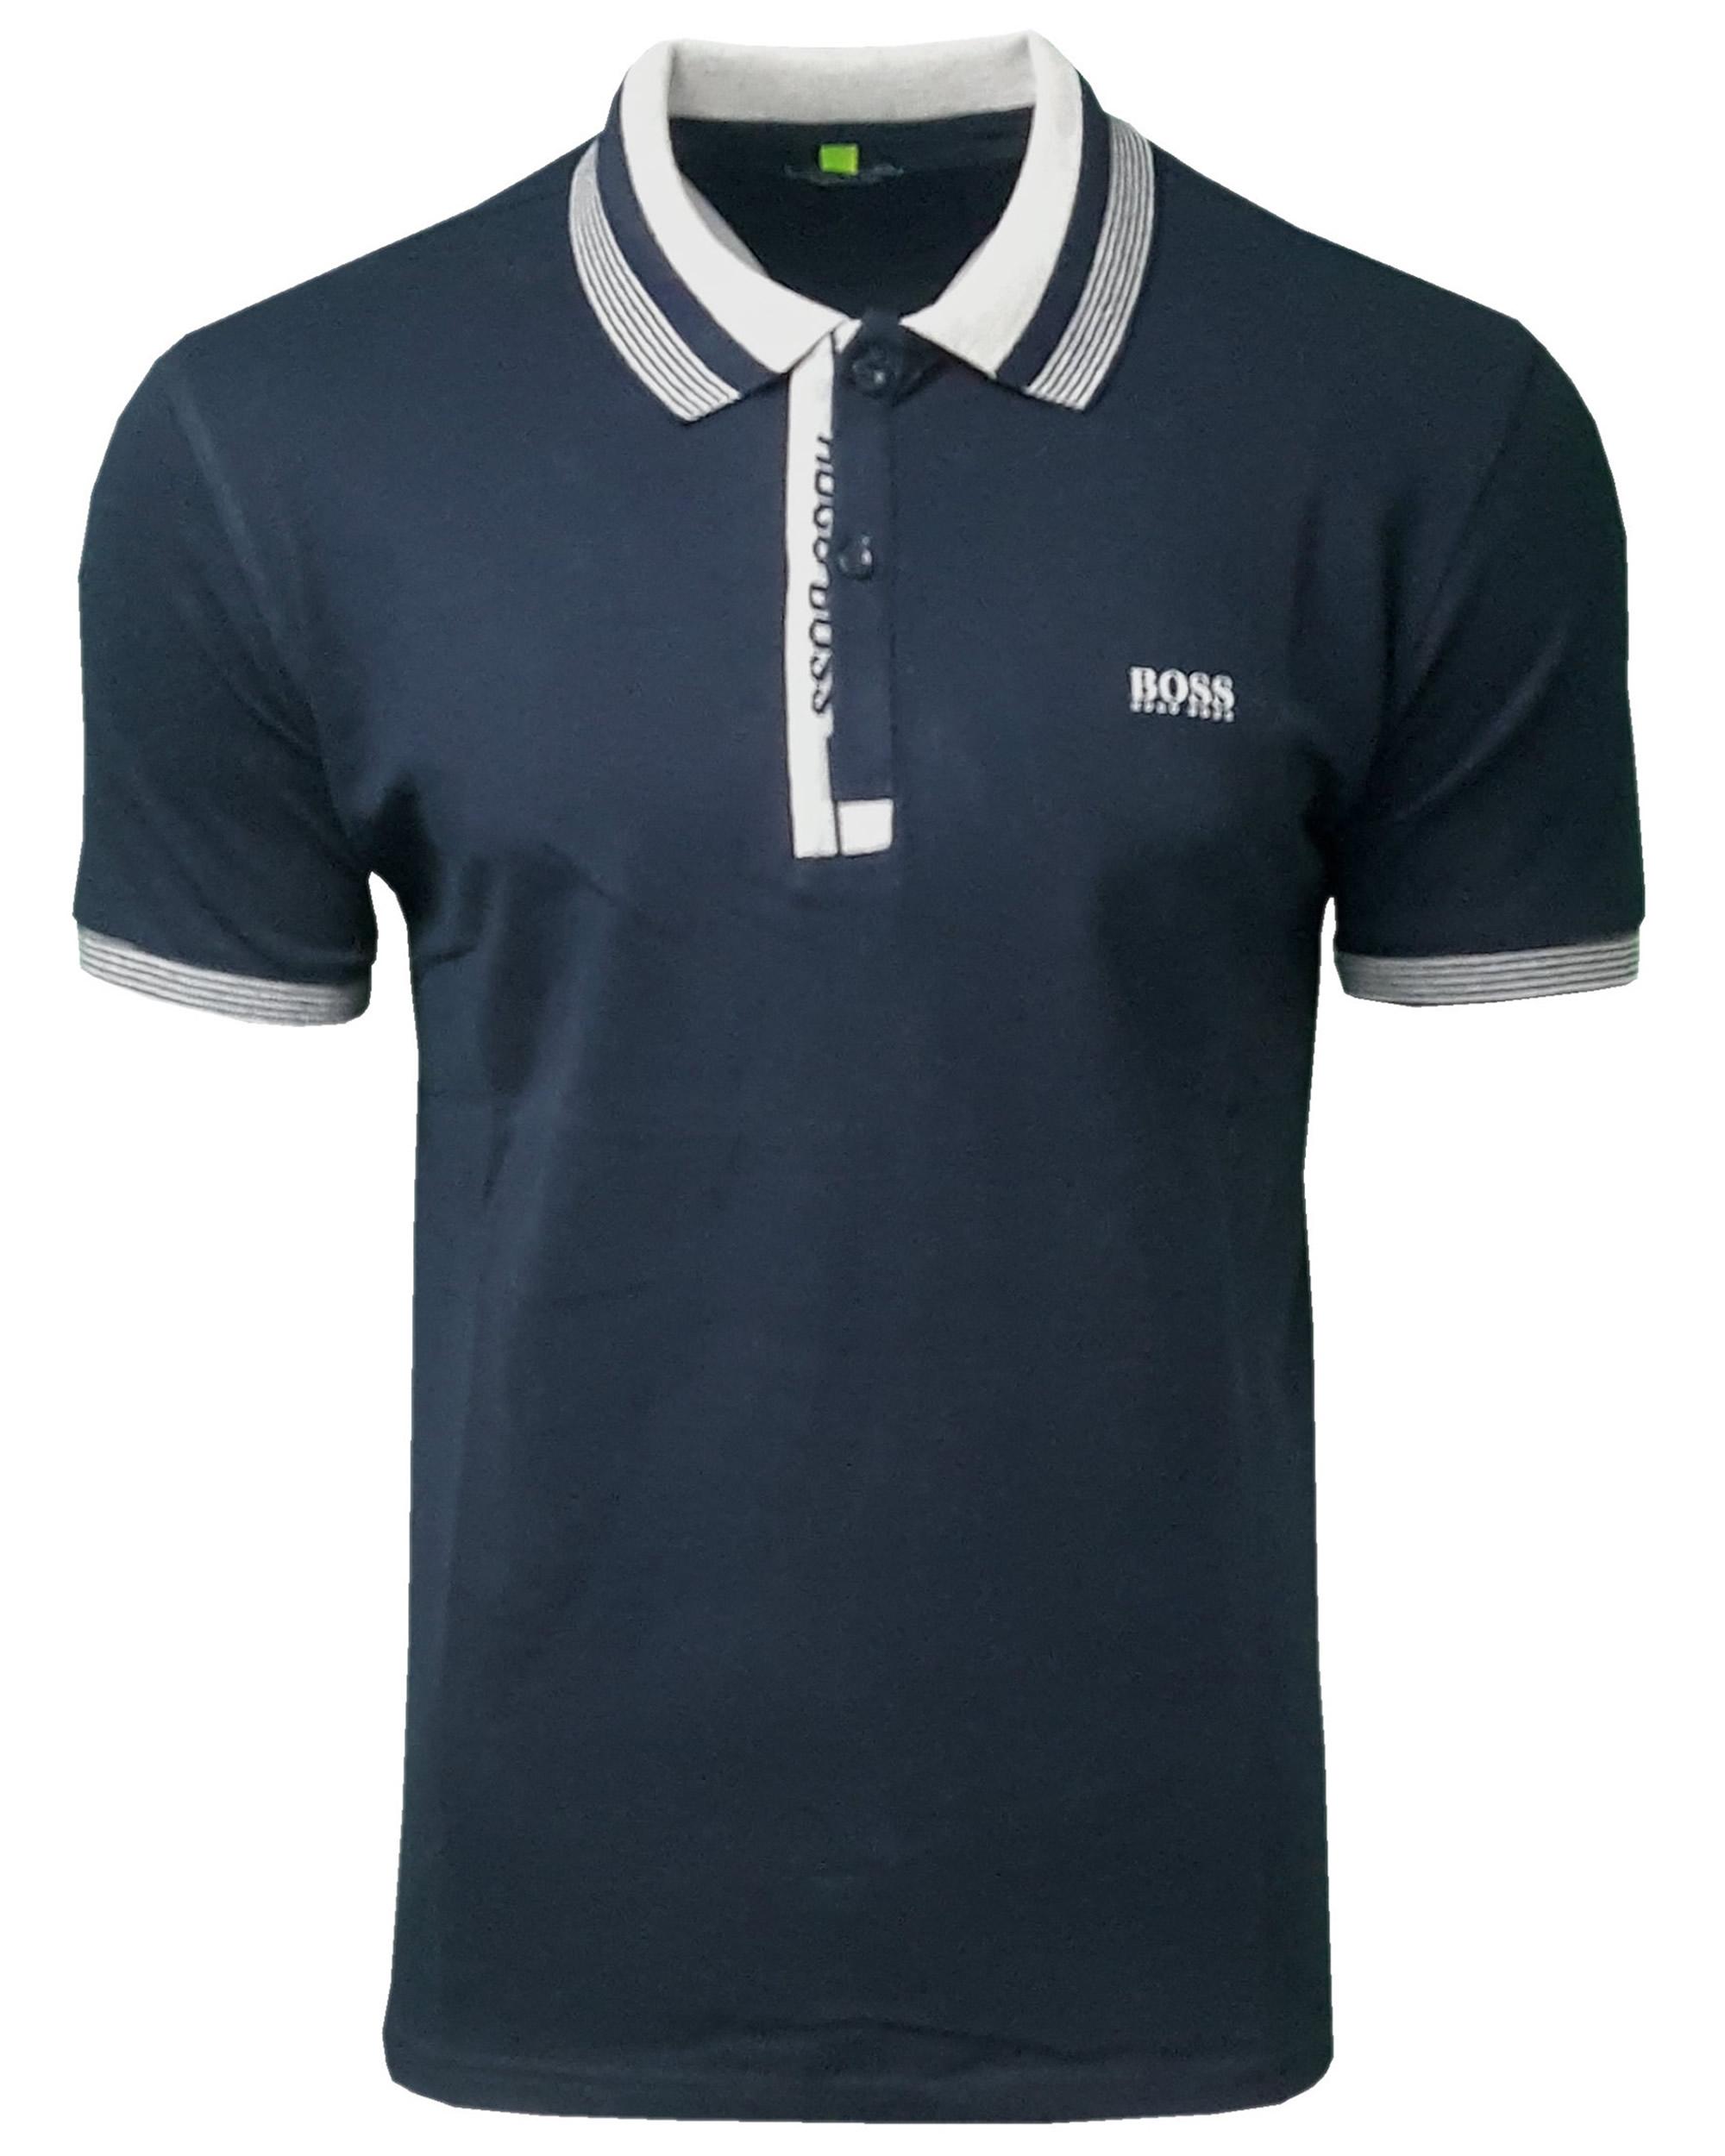 8e613fbcf Hugo Boss Paule Polo Shirt. Short Sleeve in Navy Blue